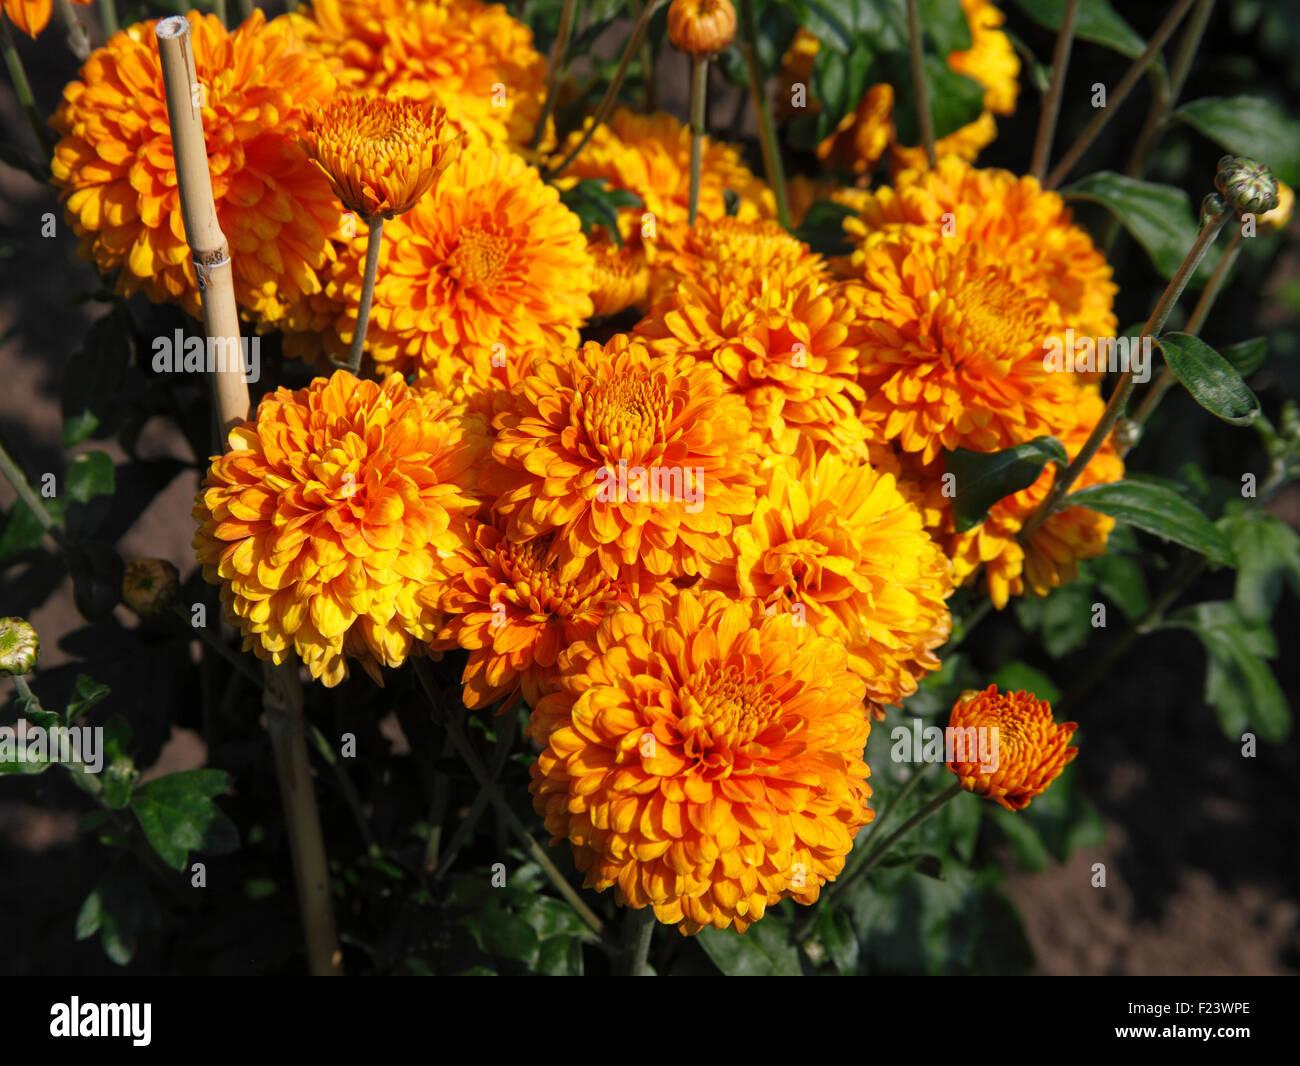 Chrysanthemum 'Pennine Bullion' close up of flowers - Stock Image